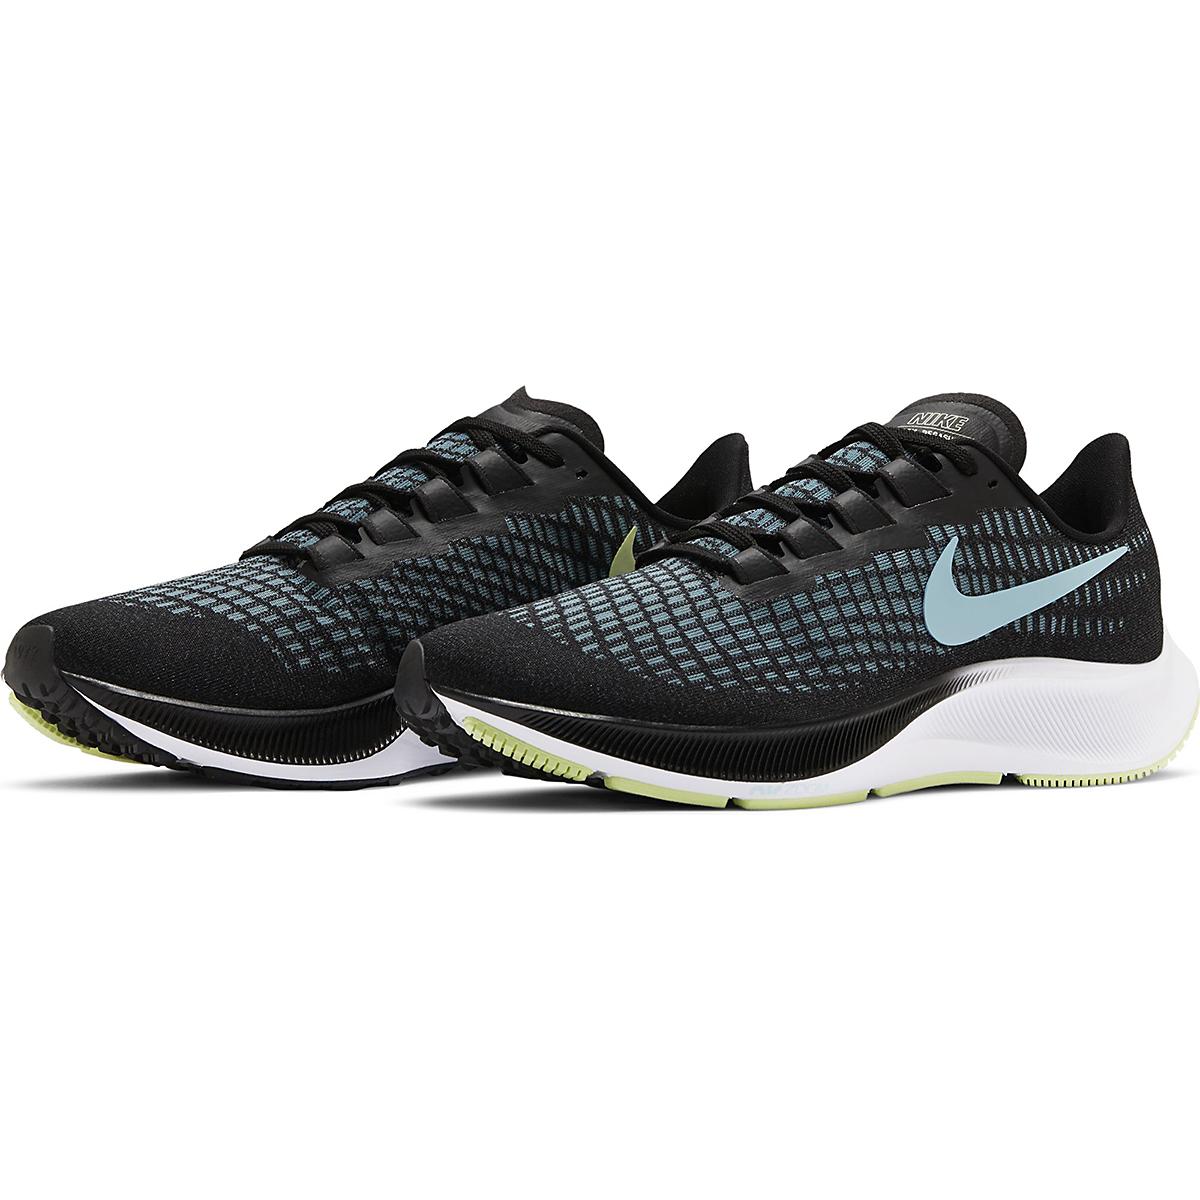 Women's Nike Air Zoom Pegasus 37 Running Shoe - Color: Black/Glacier Ice-Barely Volt-White - Size: 6 - Width: Regular, Black/Glacier Ice-Barely Volt-White, large, image 3